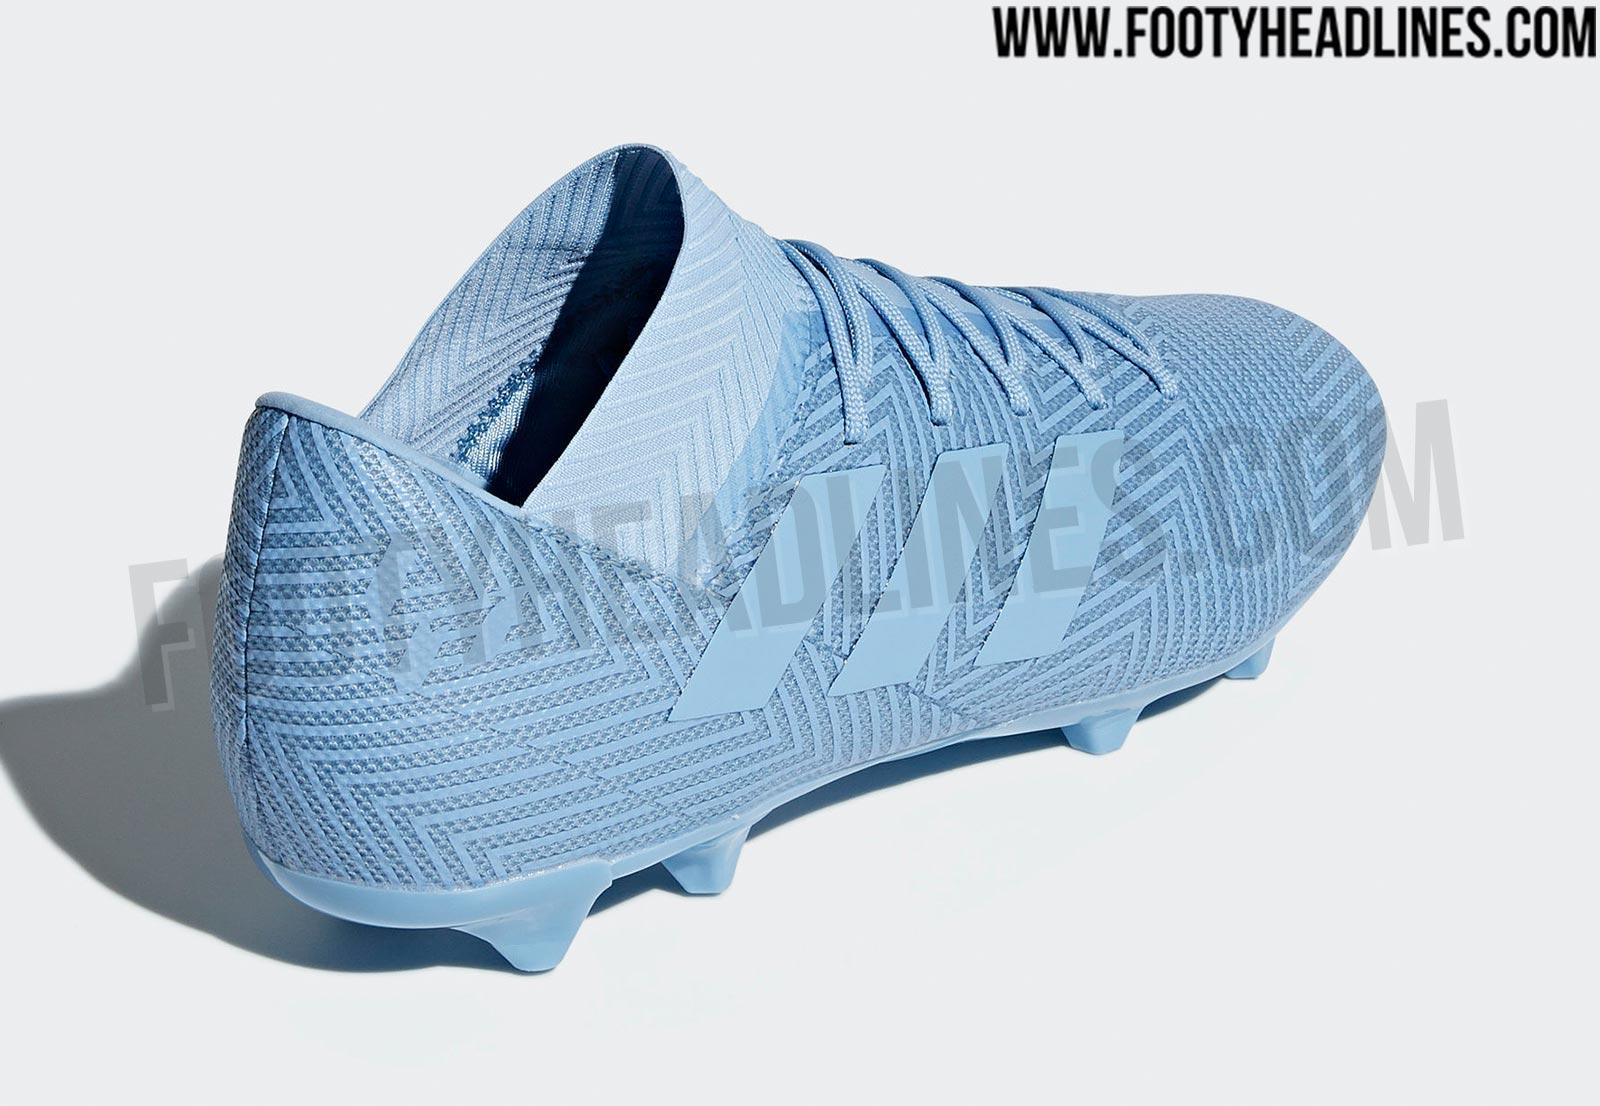 Powder Blue Adidas Nemeziz Messi 2018-19 Spectral Mode Boots Leaked ... 8f6638ce1